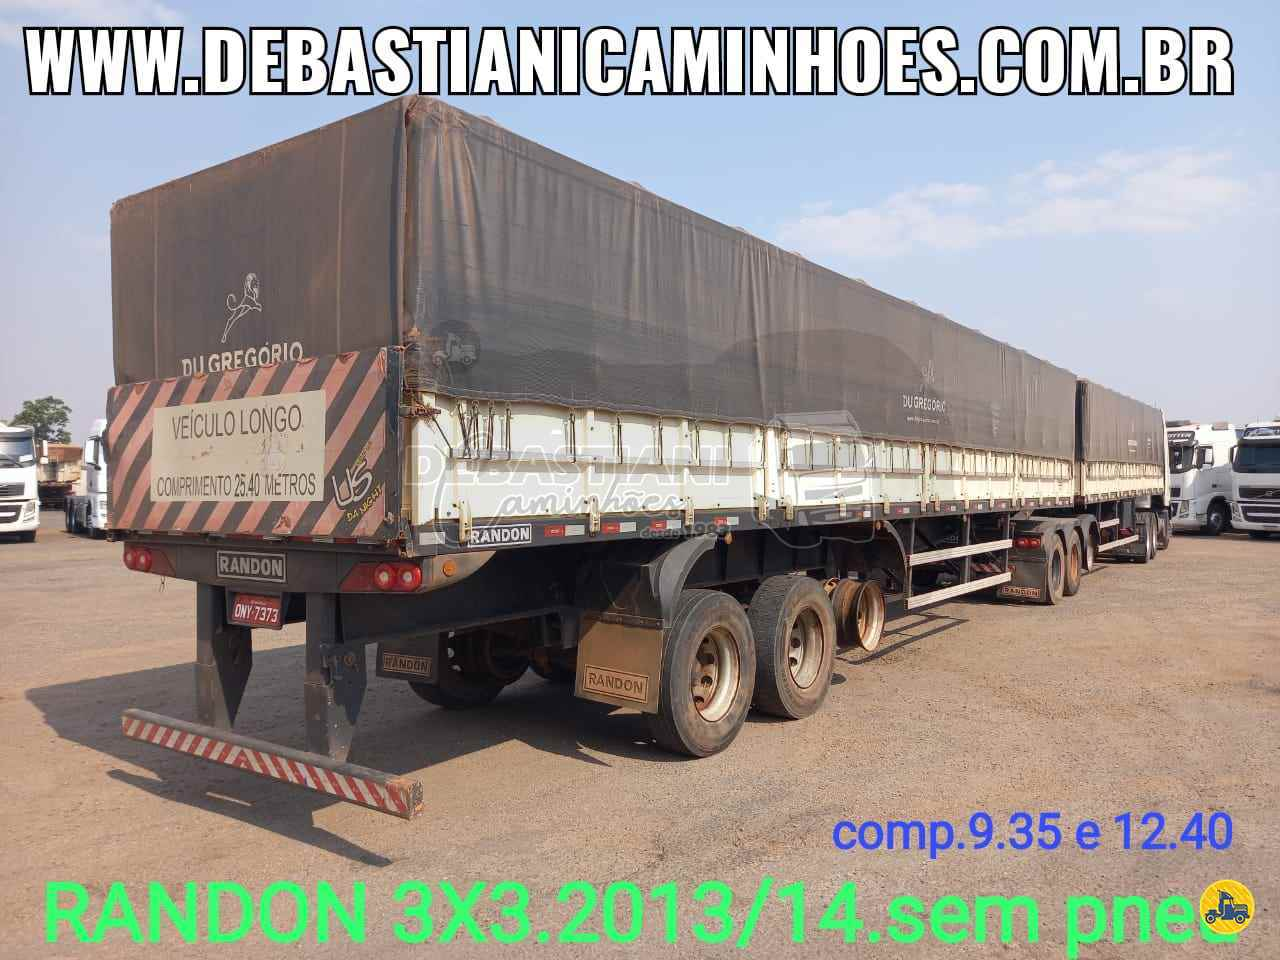 CARRETA BITREM 9 EIXOS GRANELEIRO Debastiani Caminhões ANAPOLIS GOIAS GO